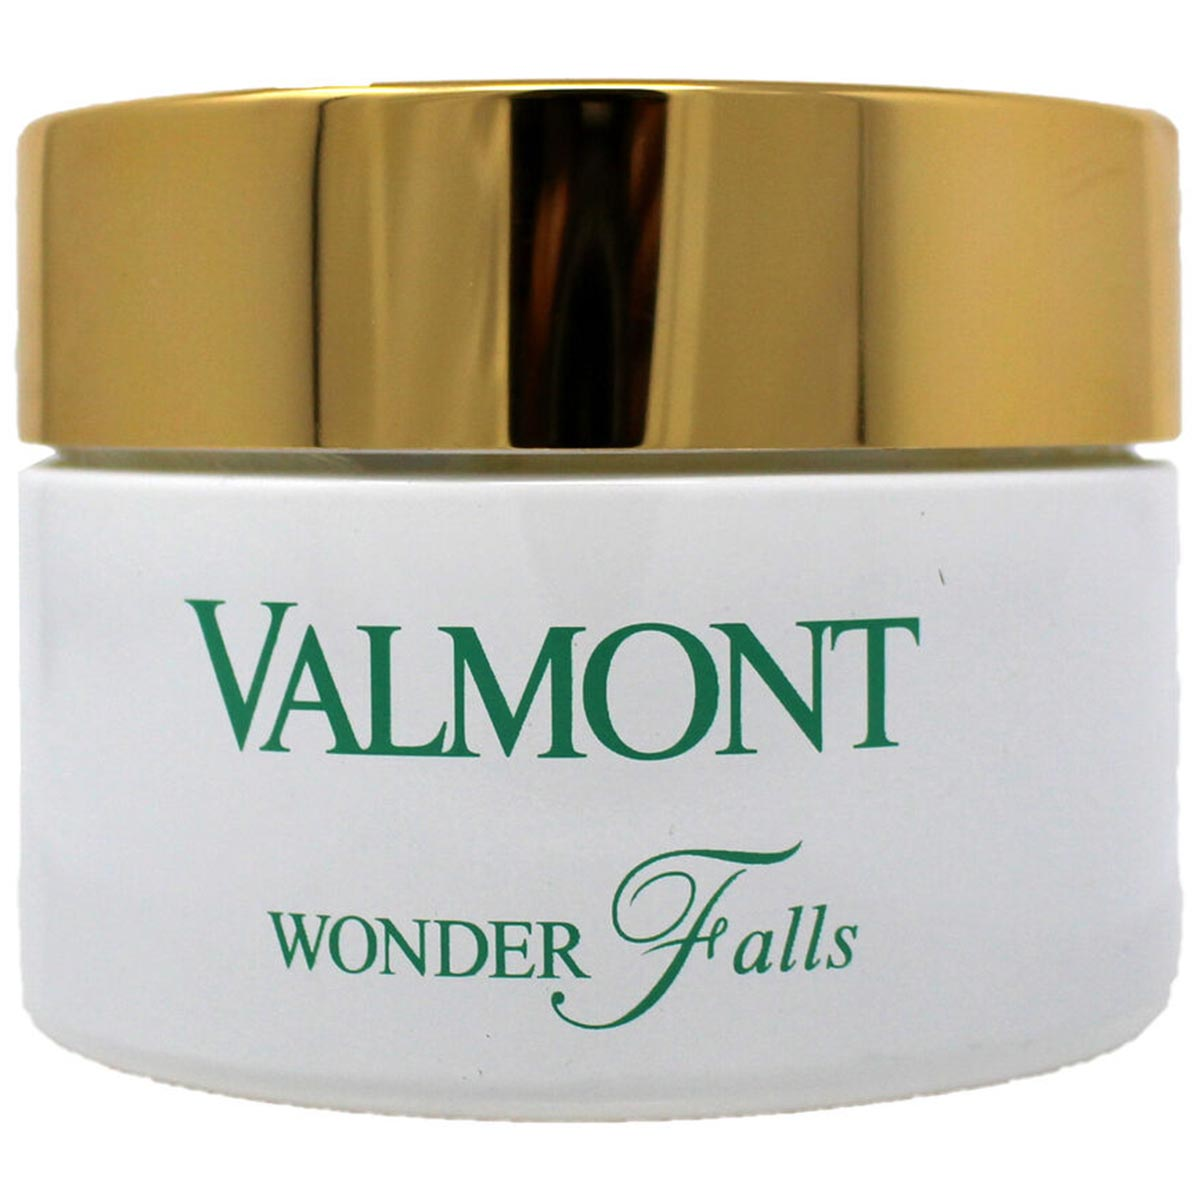 Valmont purity wonder falls cream 200ml